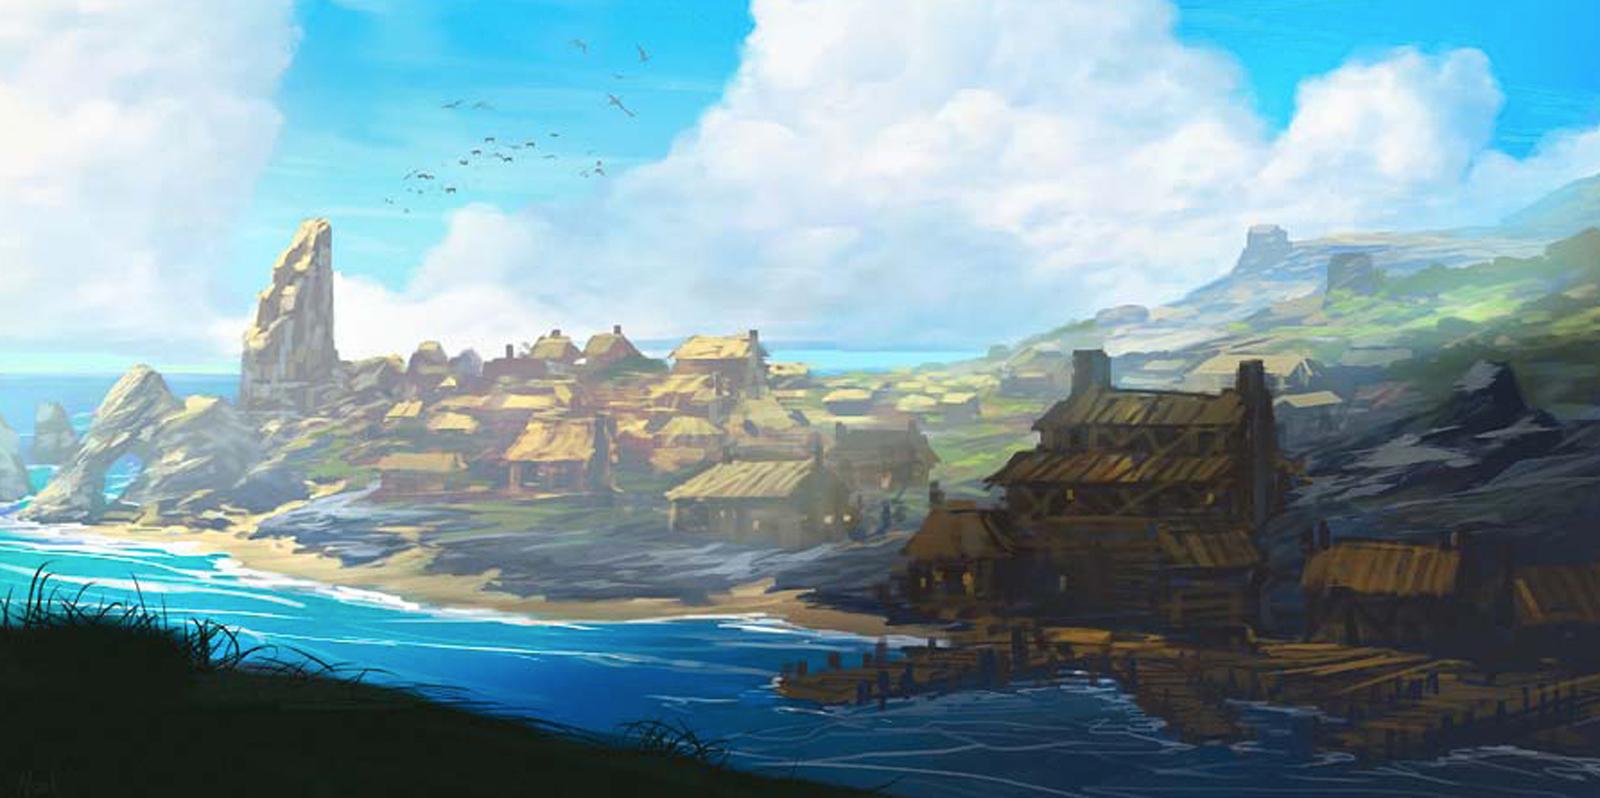 Sandpoint_cityscape.jpg